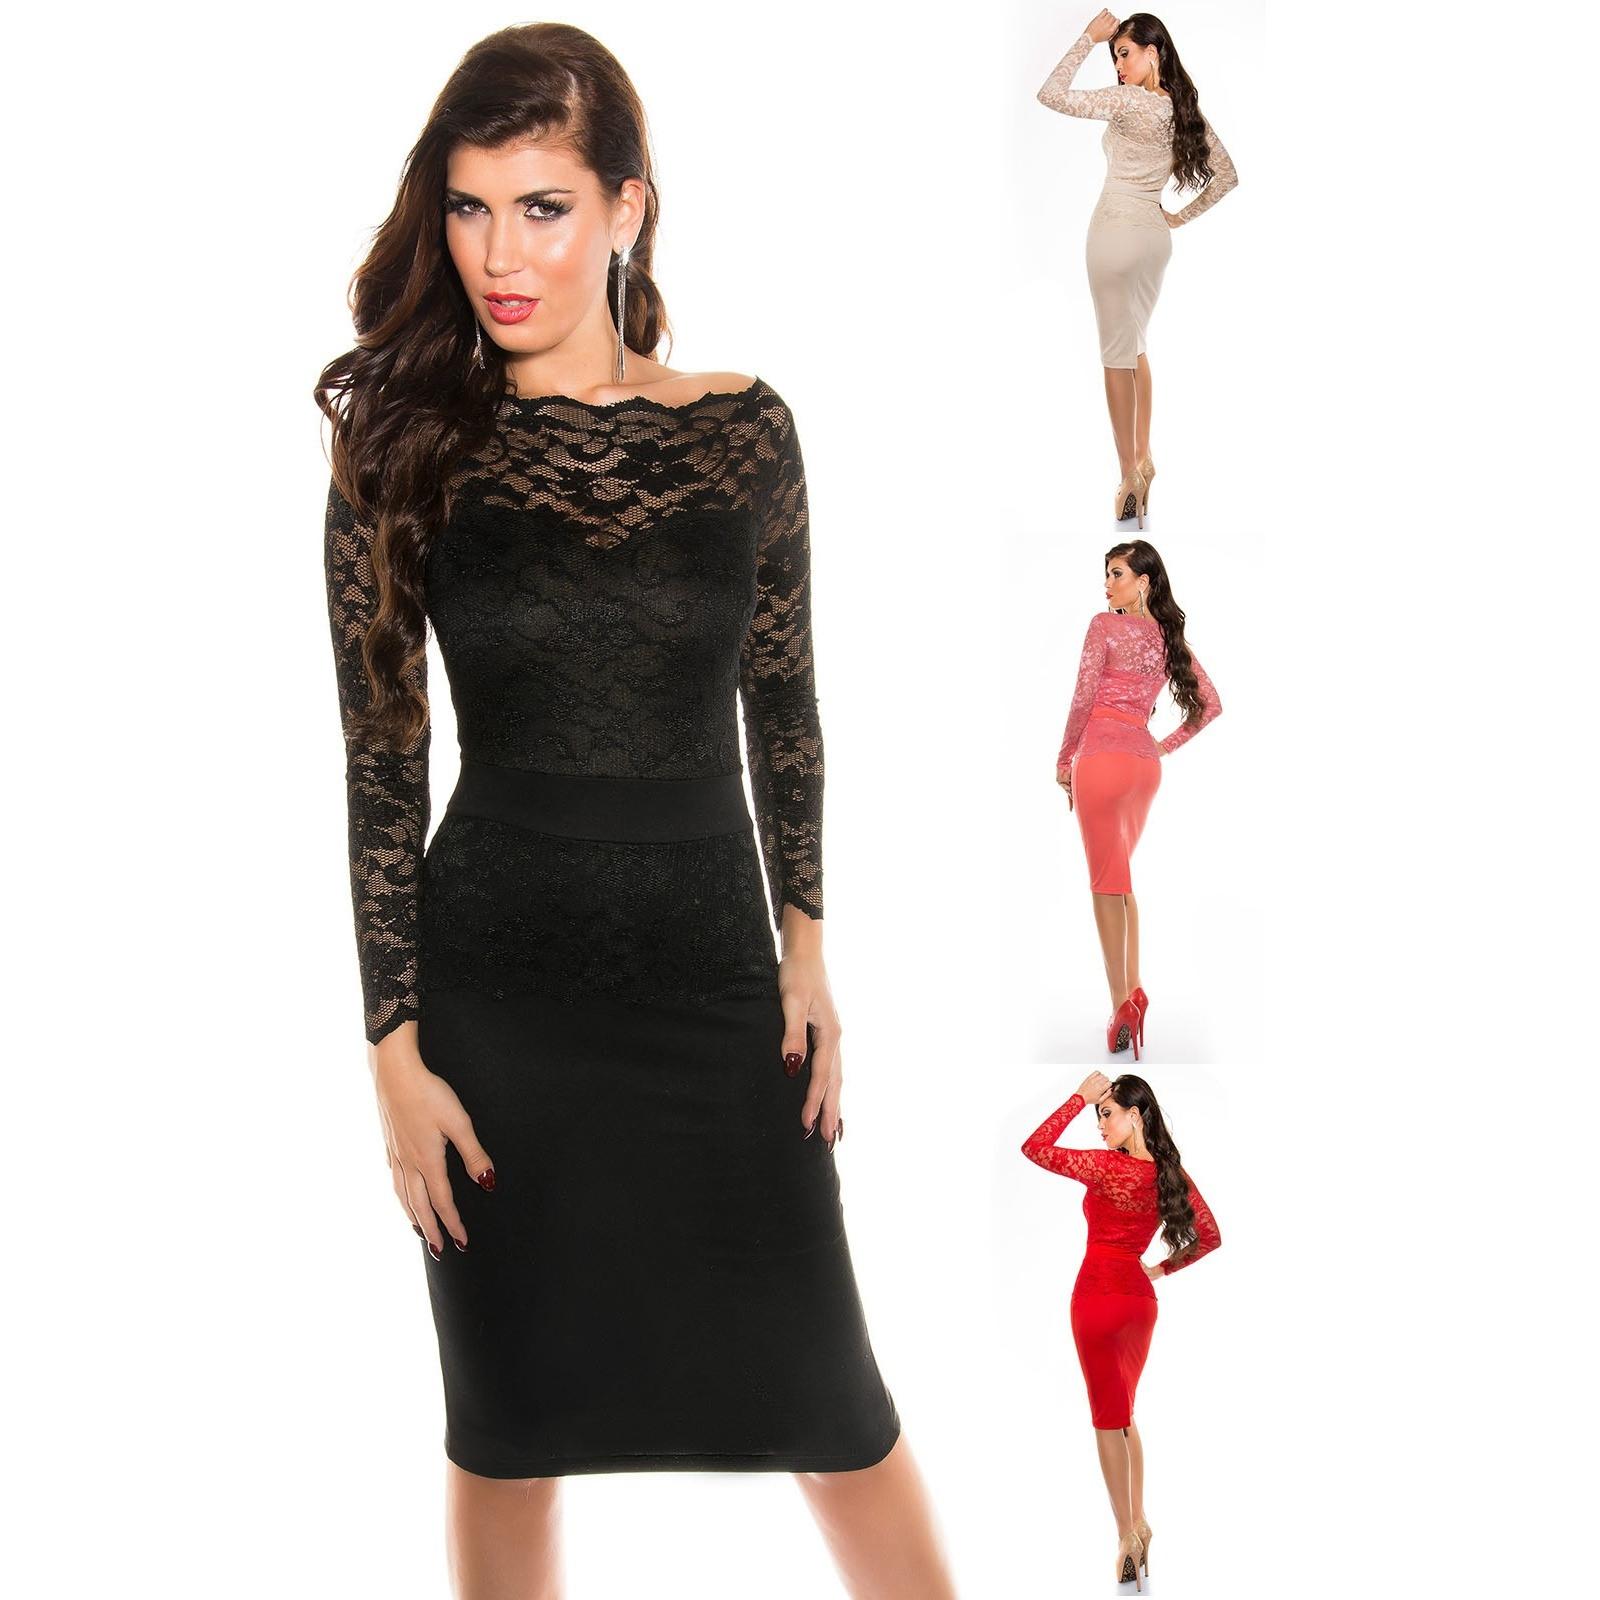 17 Wunderbar Abendkleider Lang Spitze Rot Bester Preis17 Genial Abendkleider Lang Spitze Rot Stylish